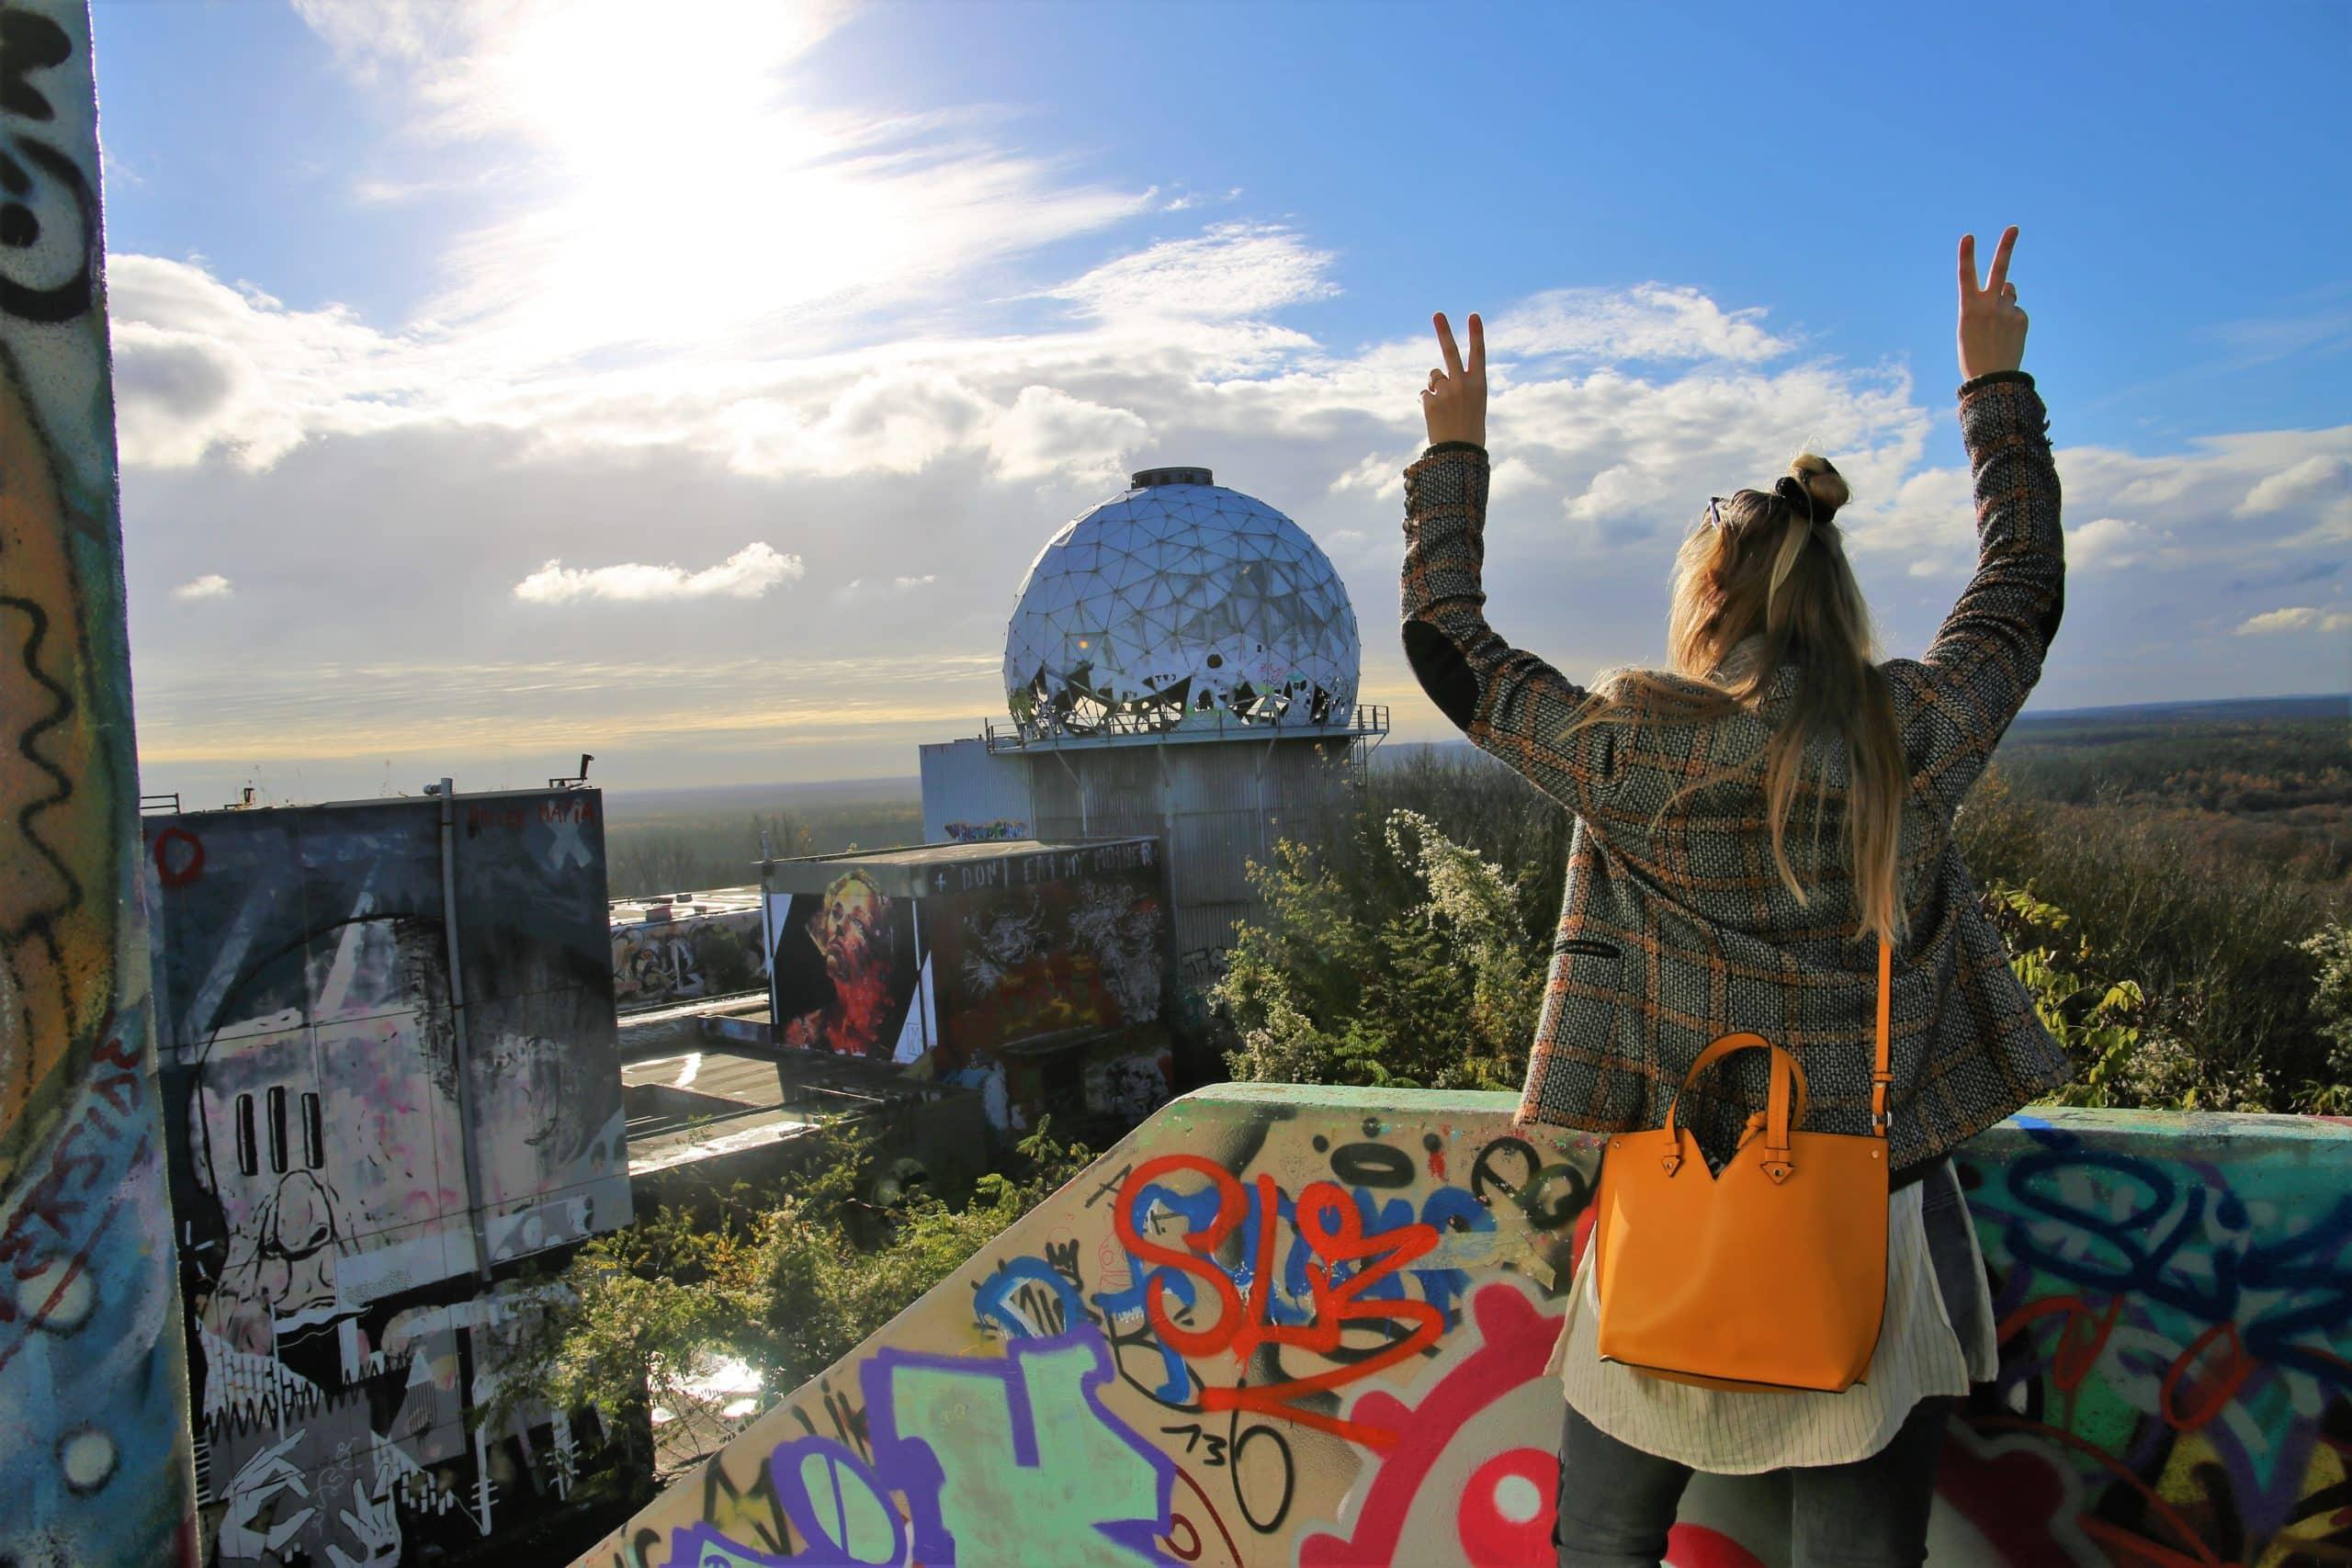 teufelsberg berlin-berlin-reisetipps-reiseblog-tagesauflug berlin